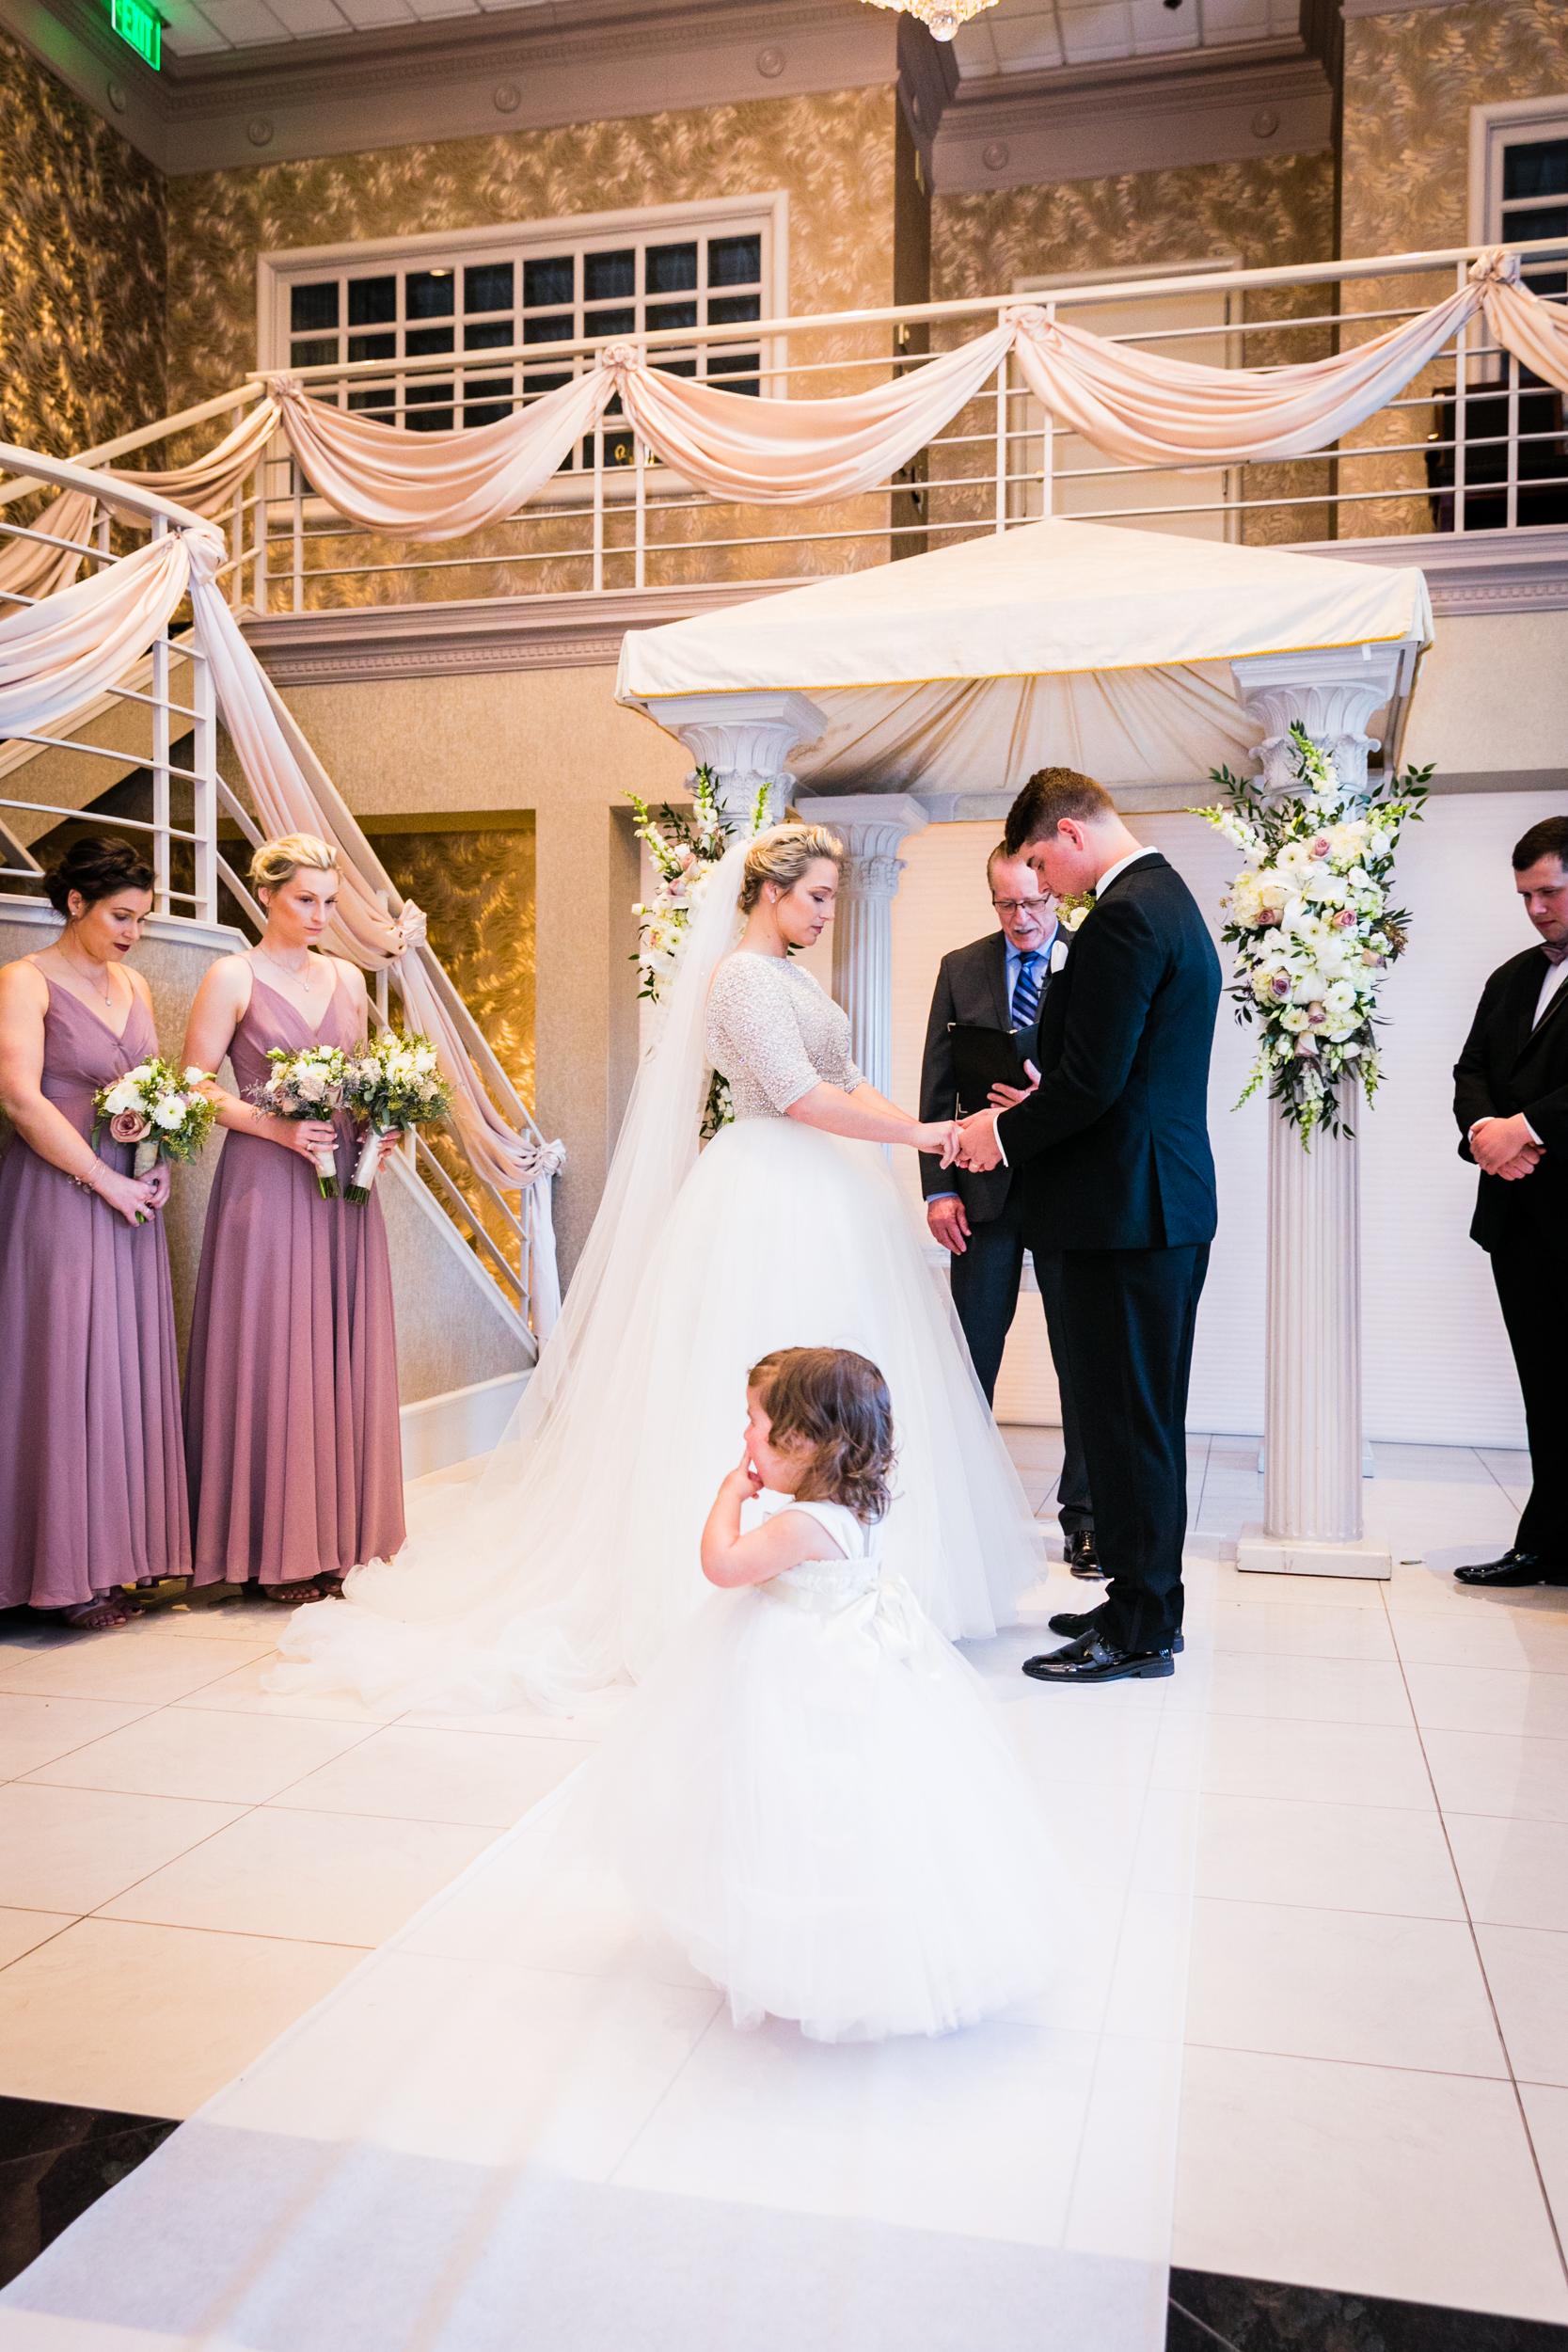 CELEBRATIONS BENSALEM WEDDING PHOTOGRAPHY-54.jpg